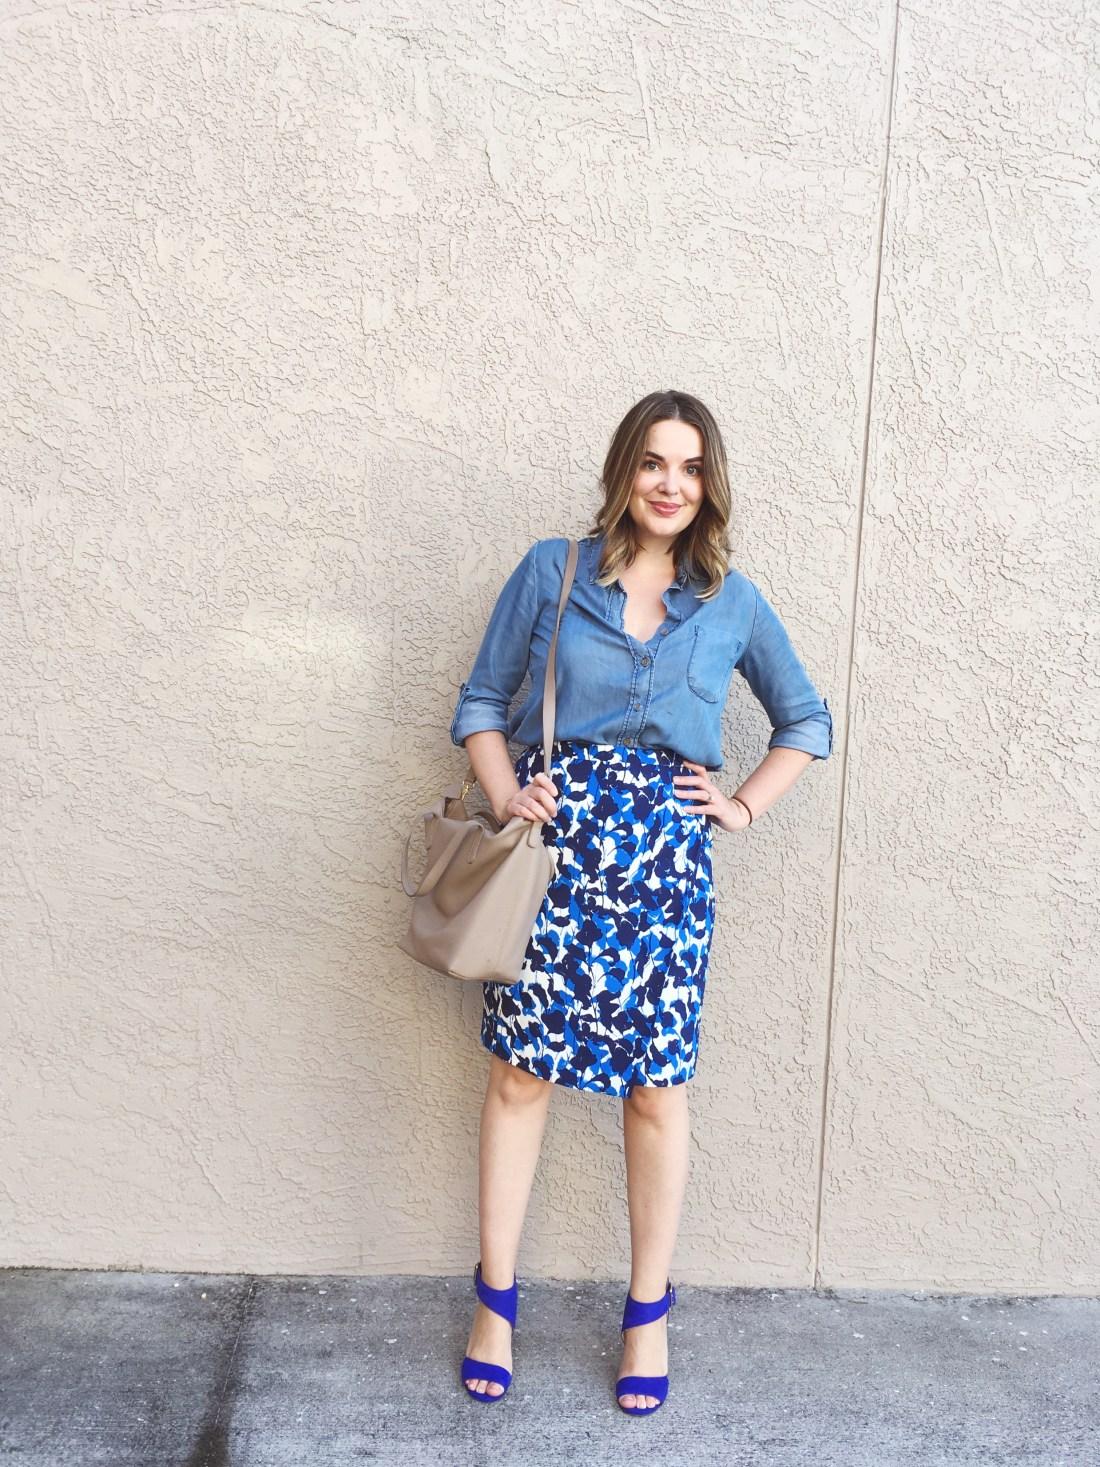 summer capsule wardrobe, wrap skirt, denim shirt and skirt, wear to work denim, 9 to 5 style, creative work outfits